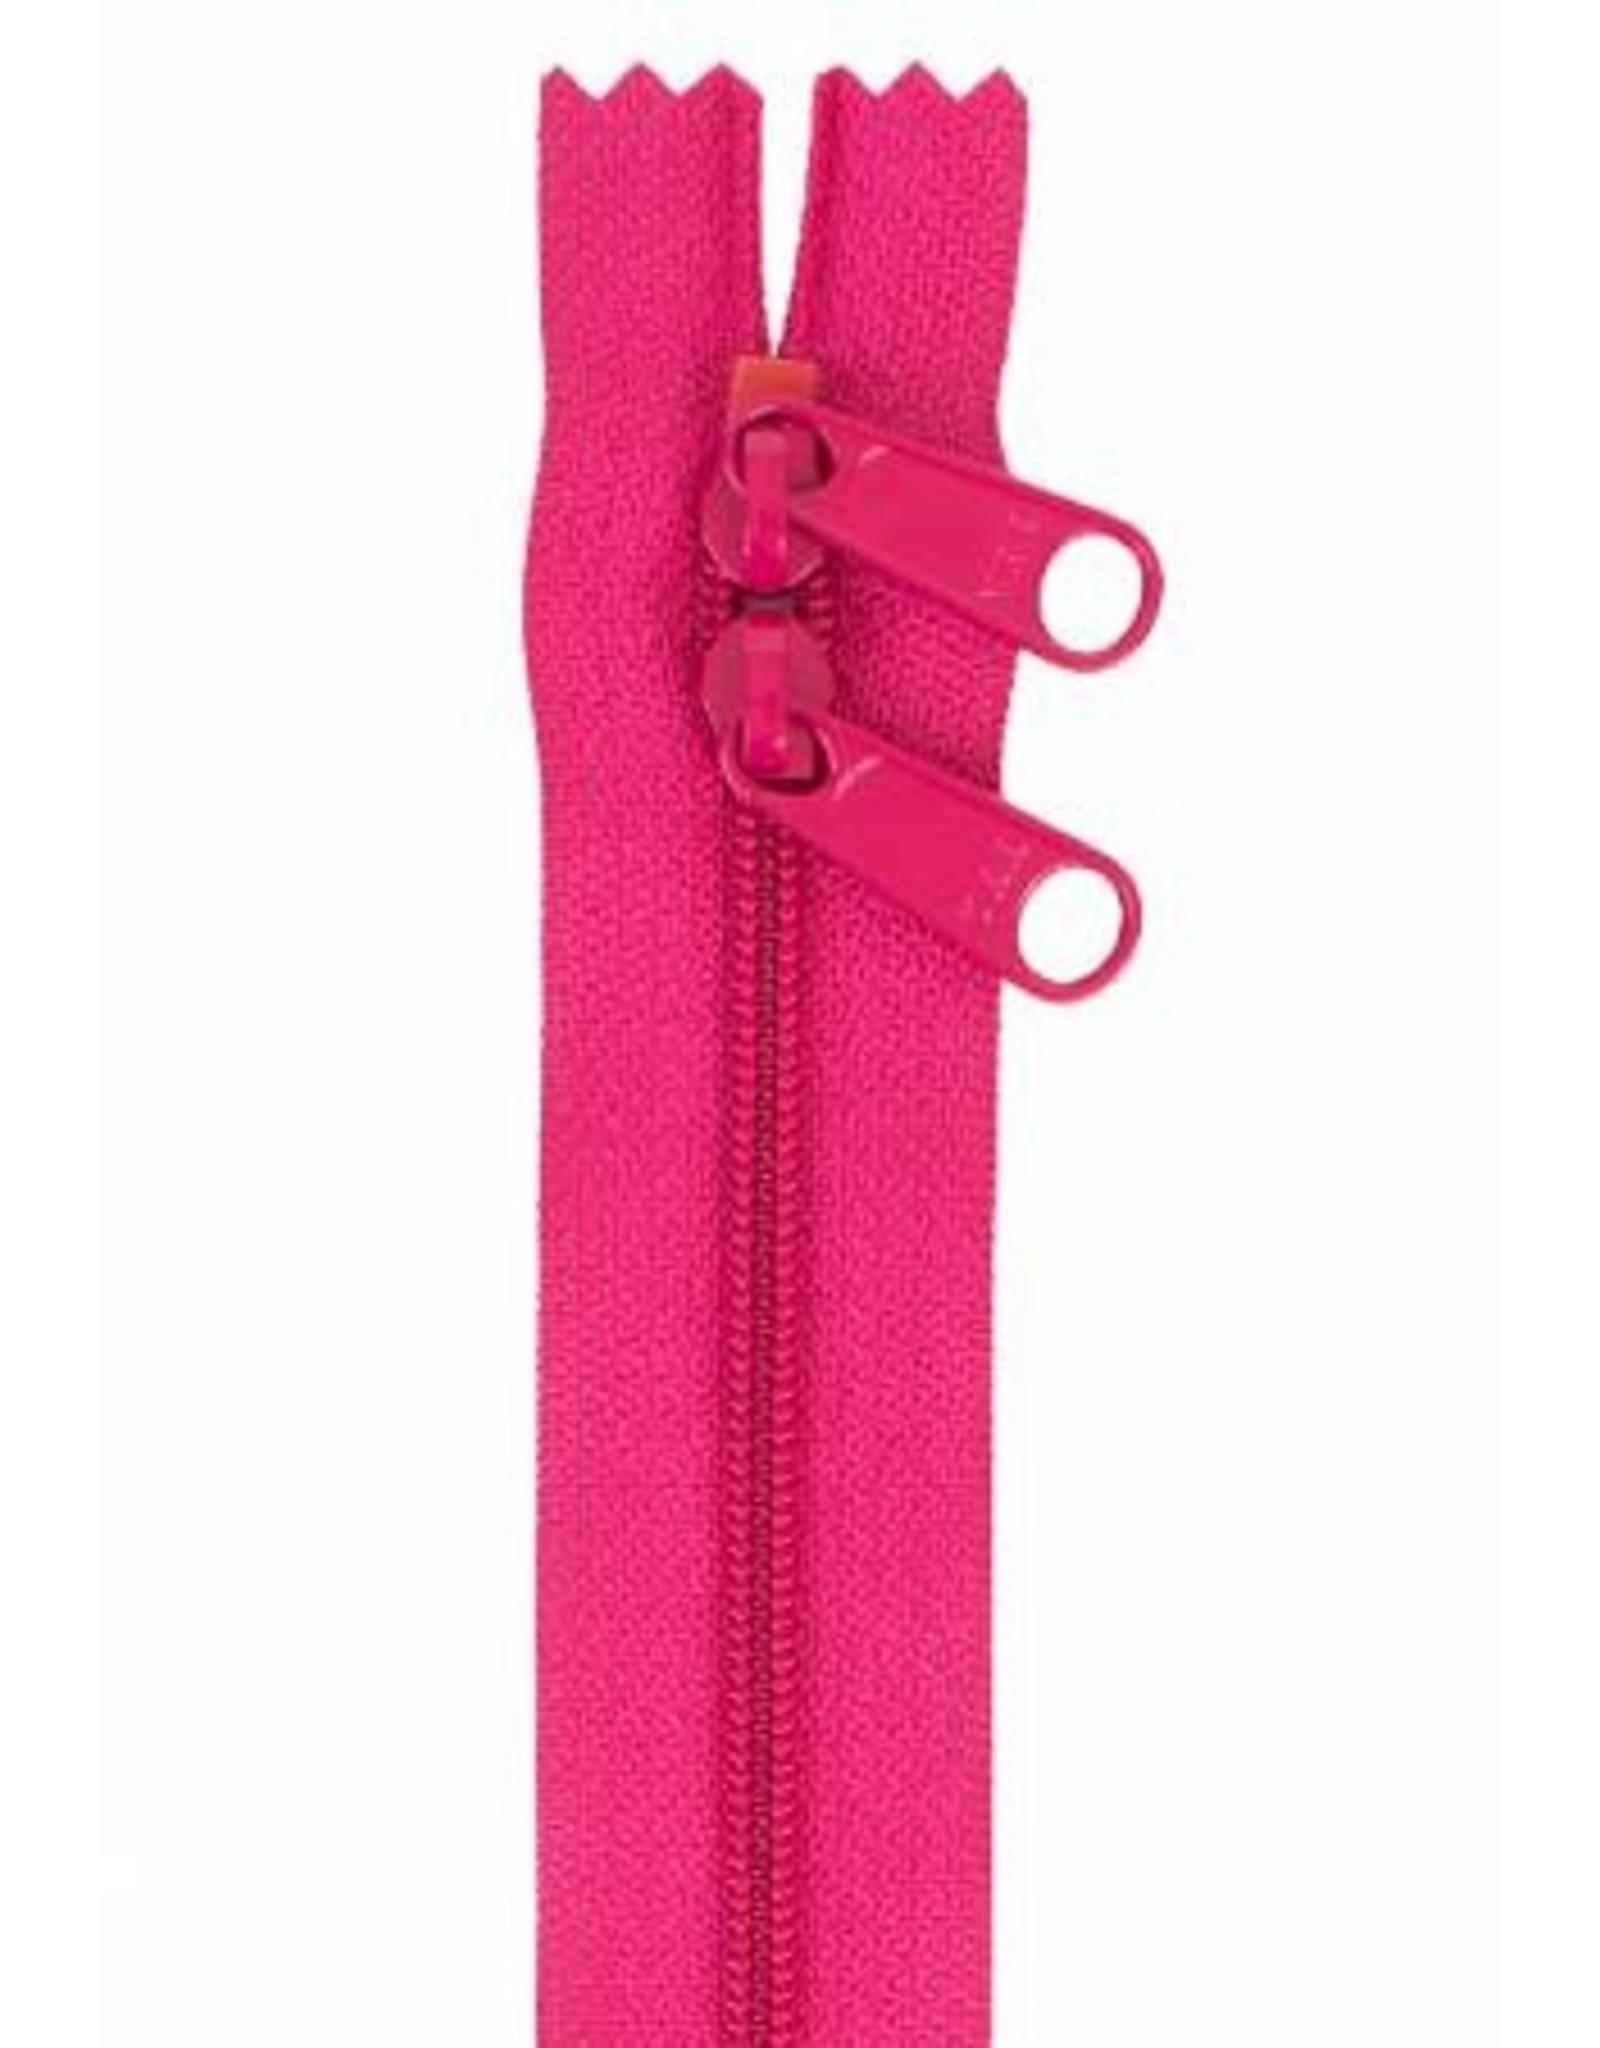 By Annie Handbag Zipper - 40 inch / 101 cm - double slide - Lipstick